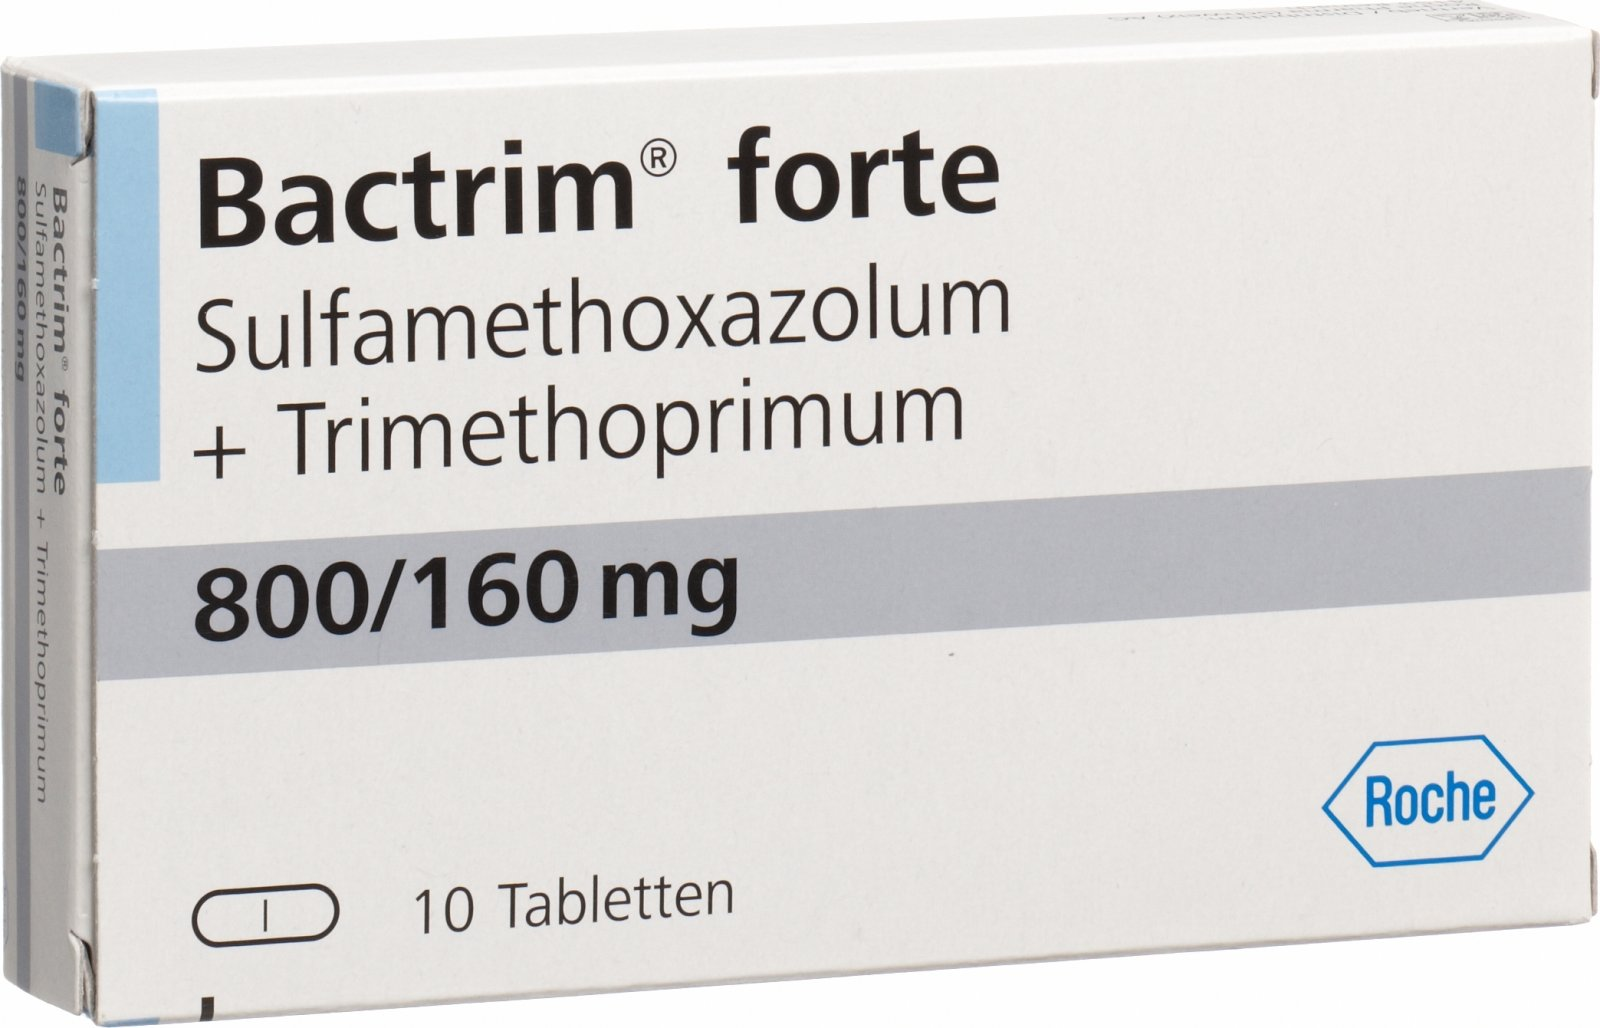 seroquel xr 400 mg price